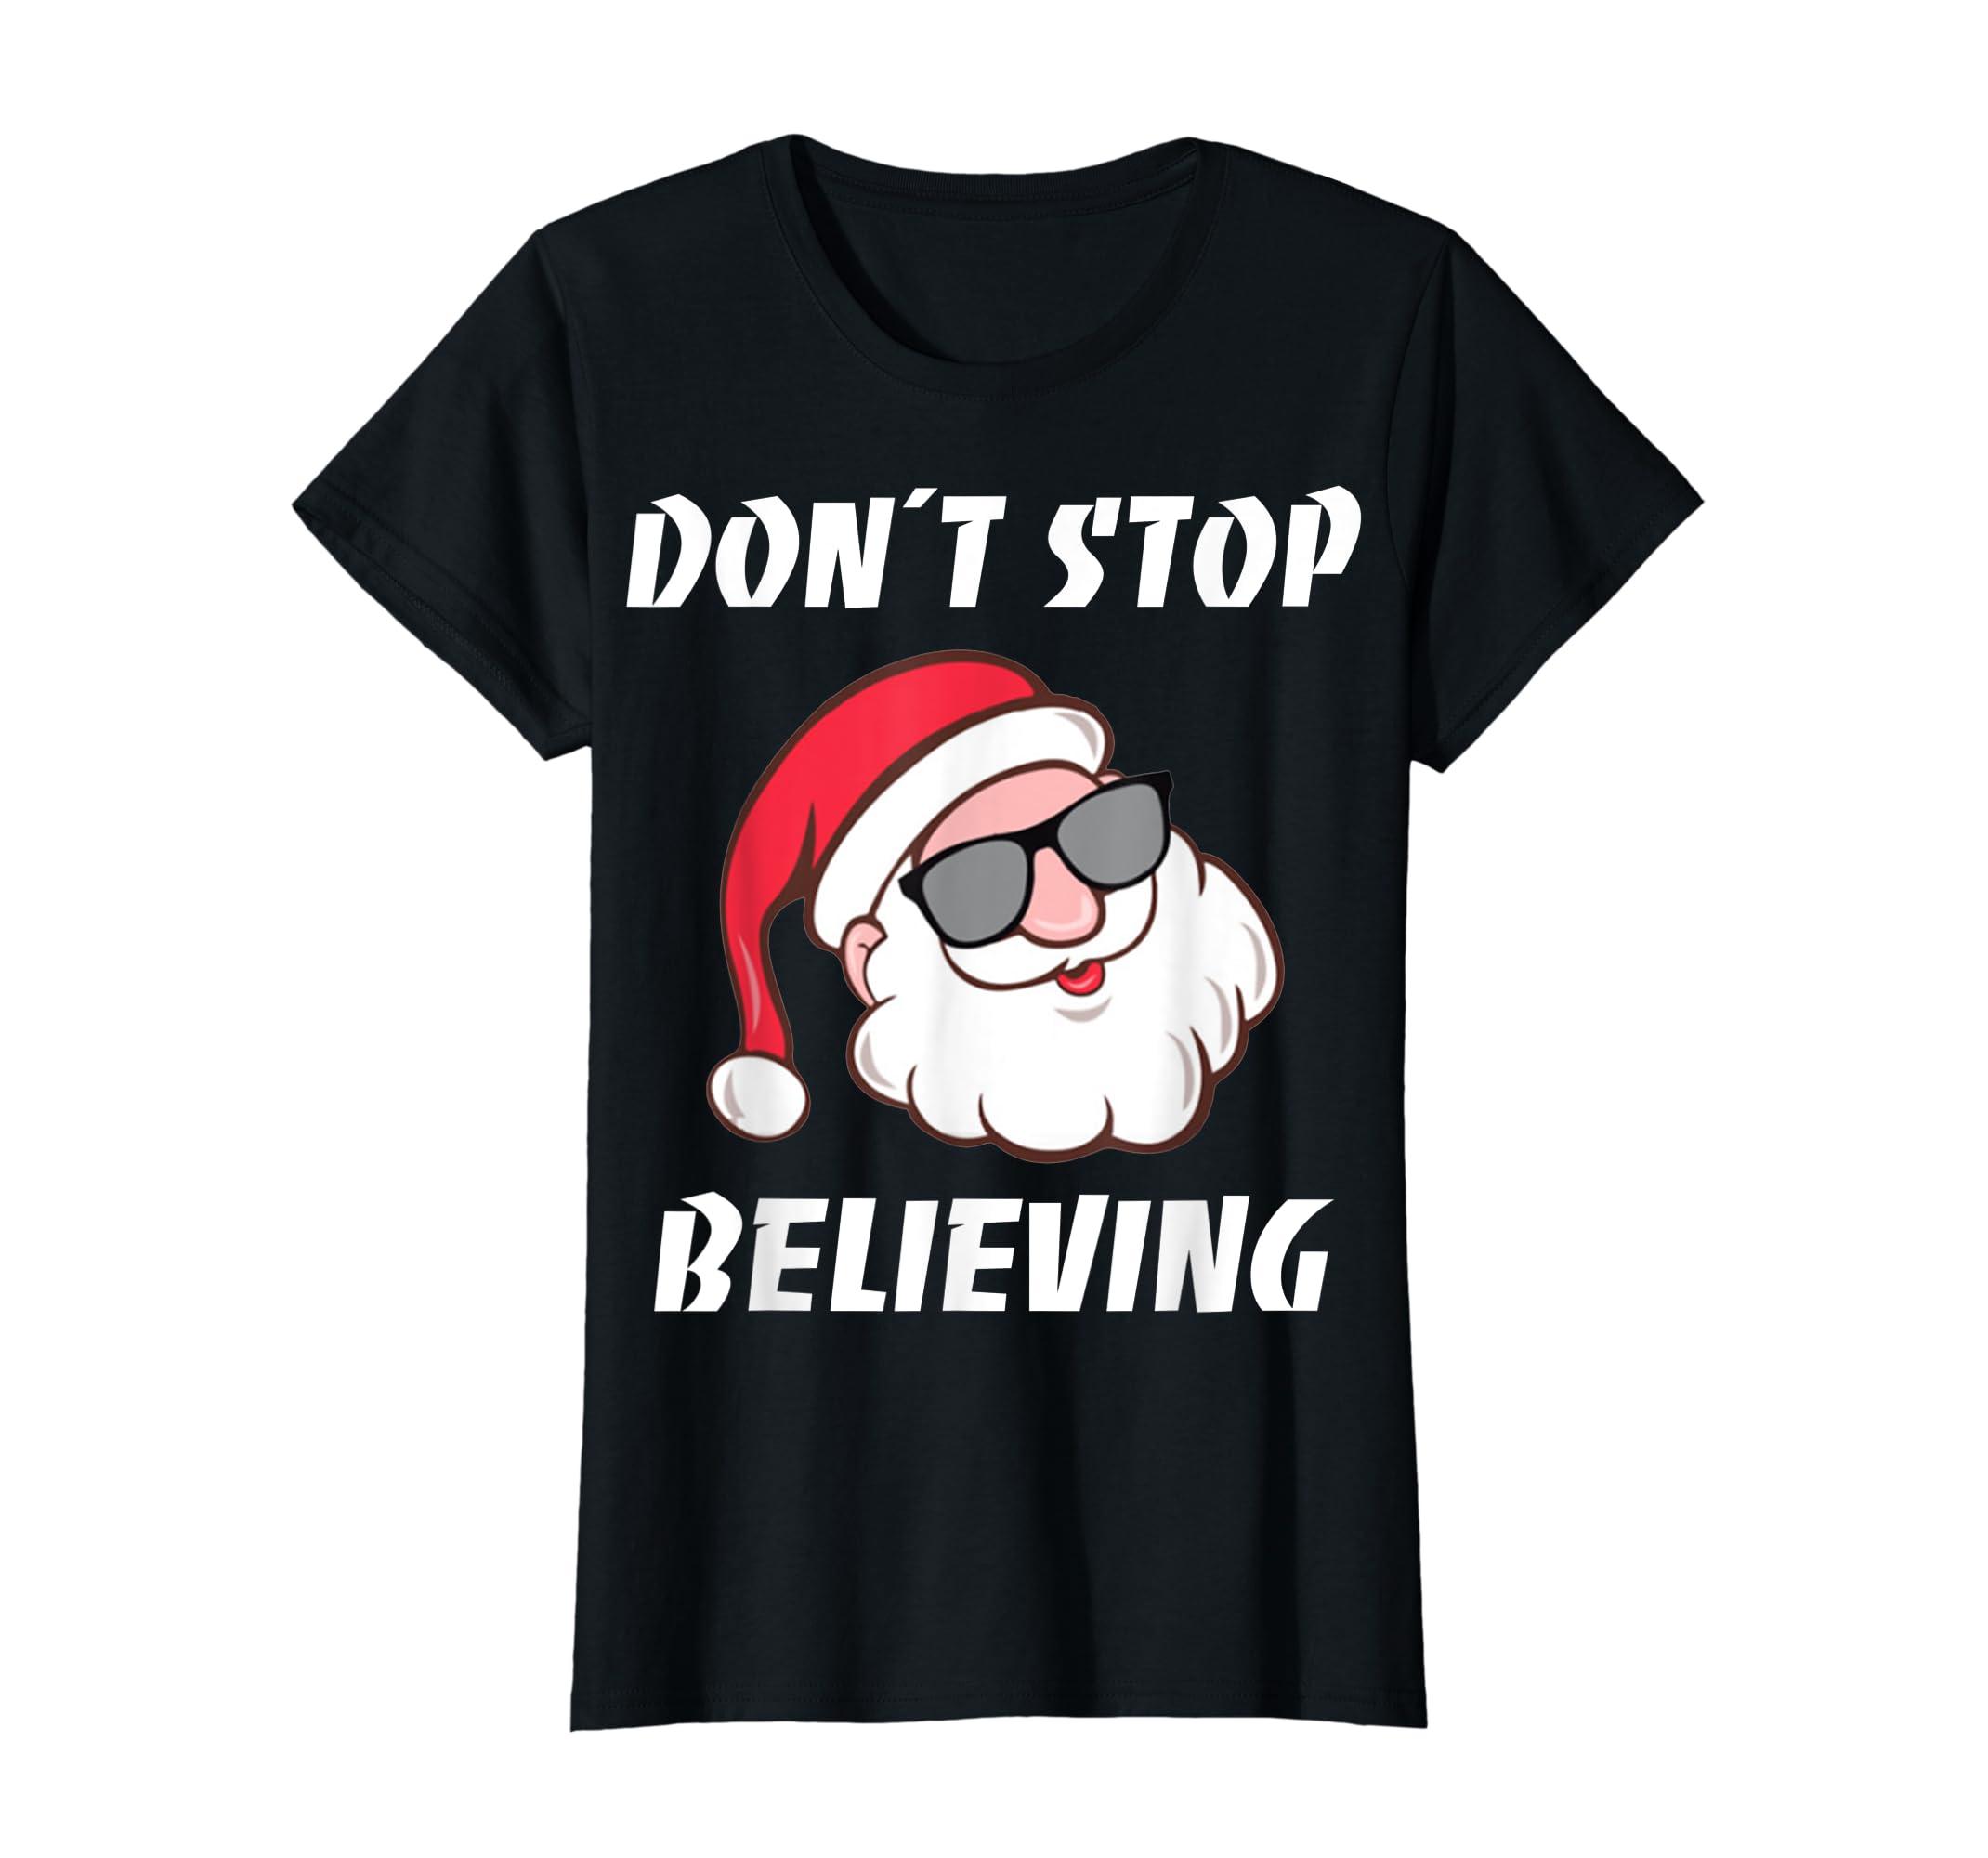 Don't Stop Believing Santa Claus Christmas T-Shirt-Women's T-Shirt-Black